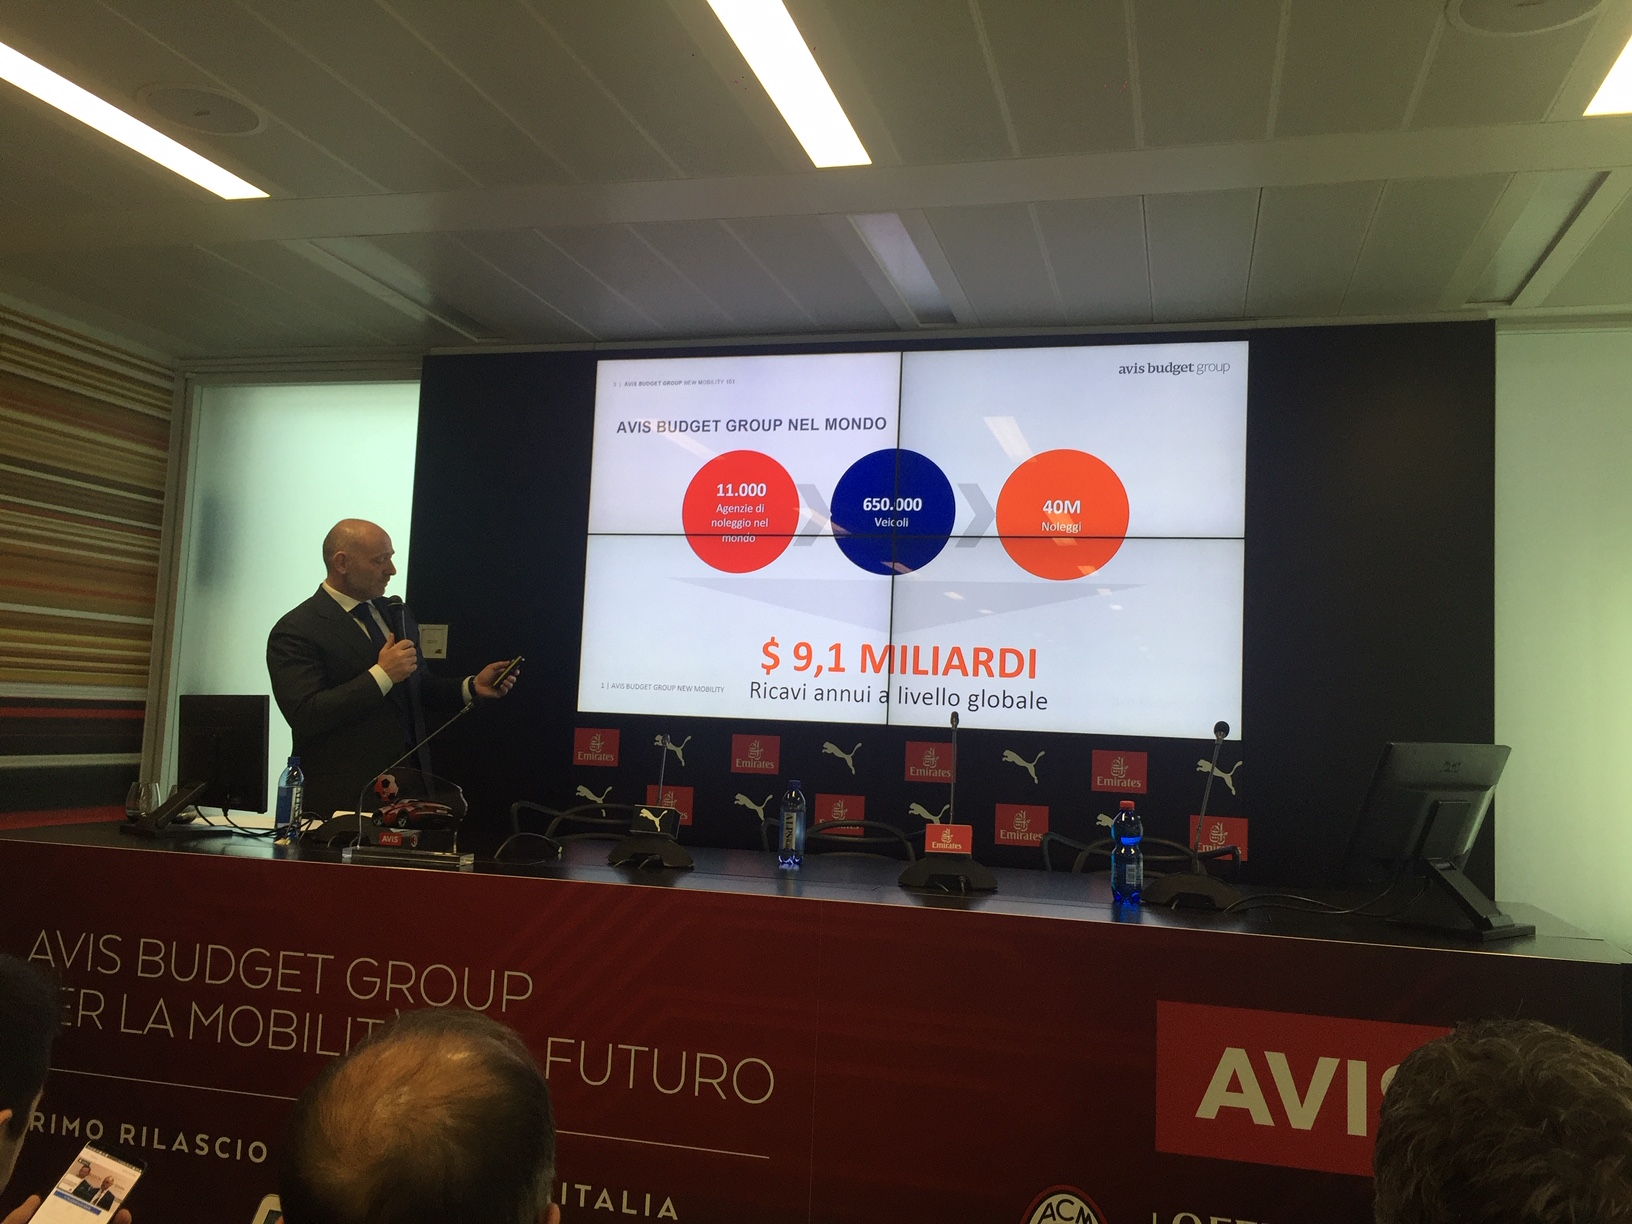 Avis Budget Group performance, world